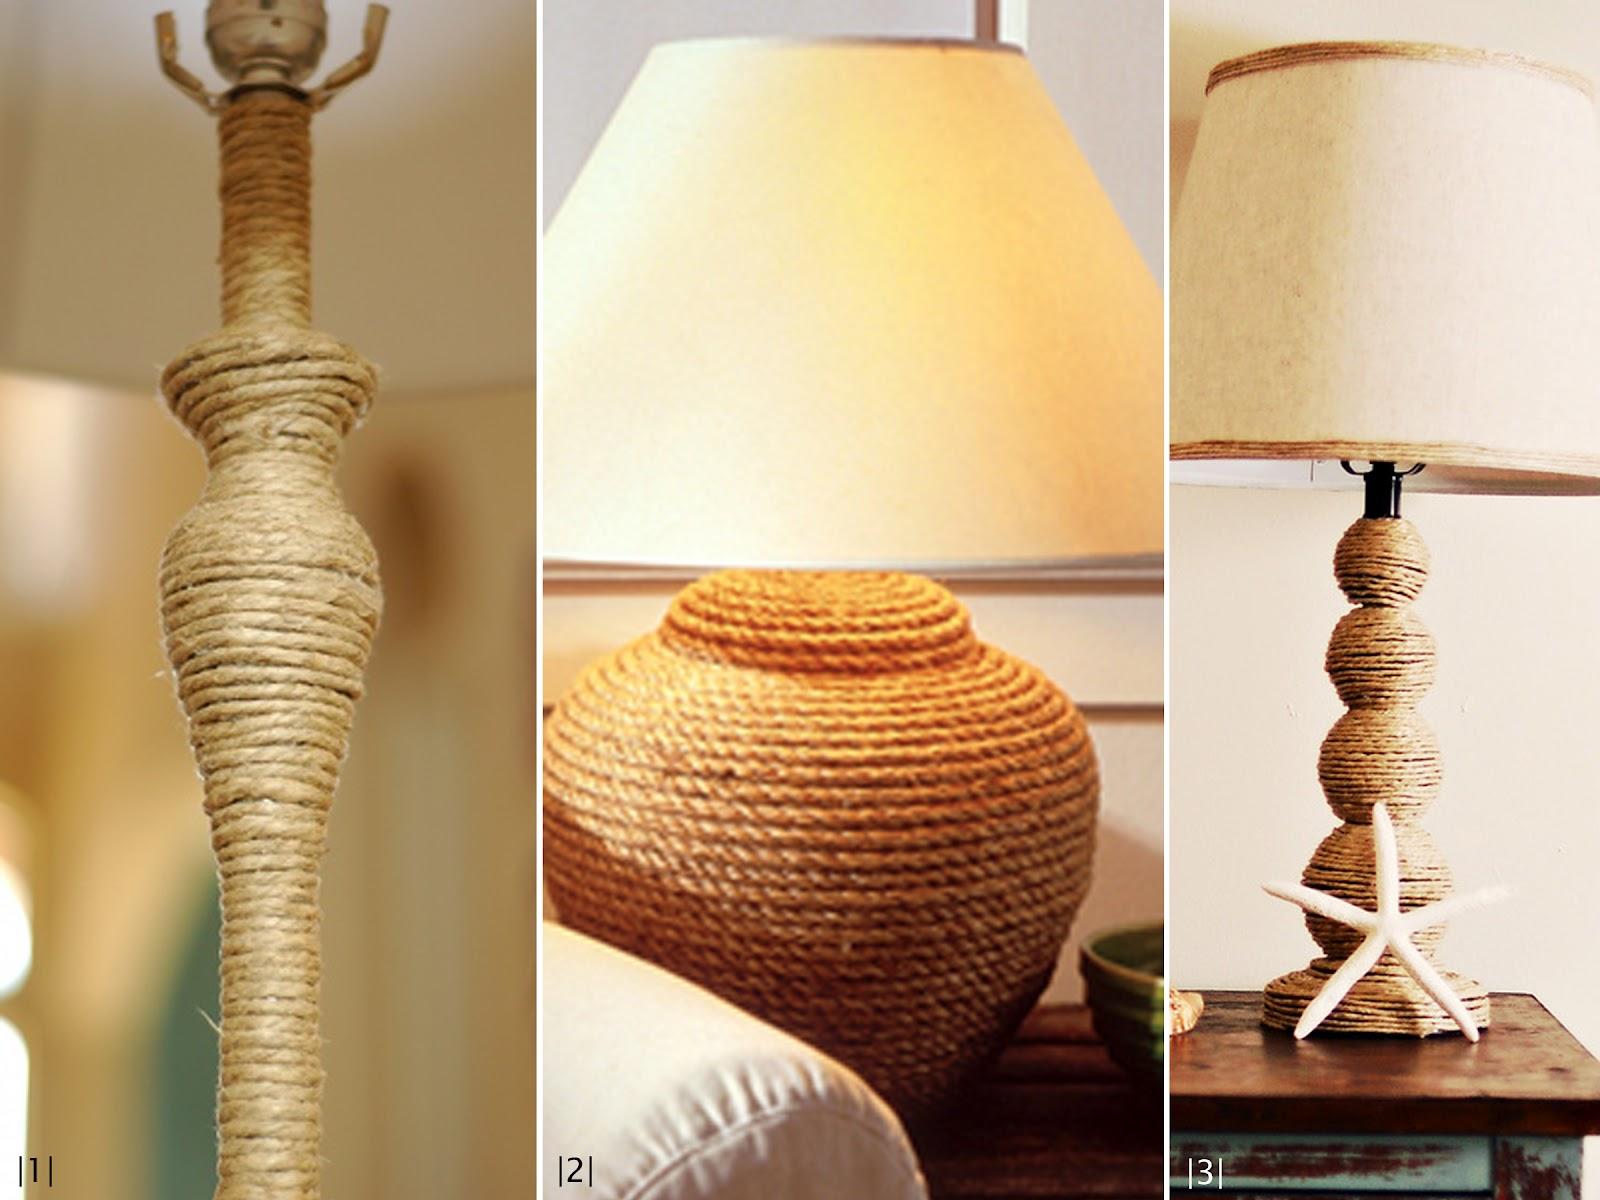 96 Diy Lamp Base Ideas Diy Lamp Shades Ideas Projects Idea Of